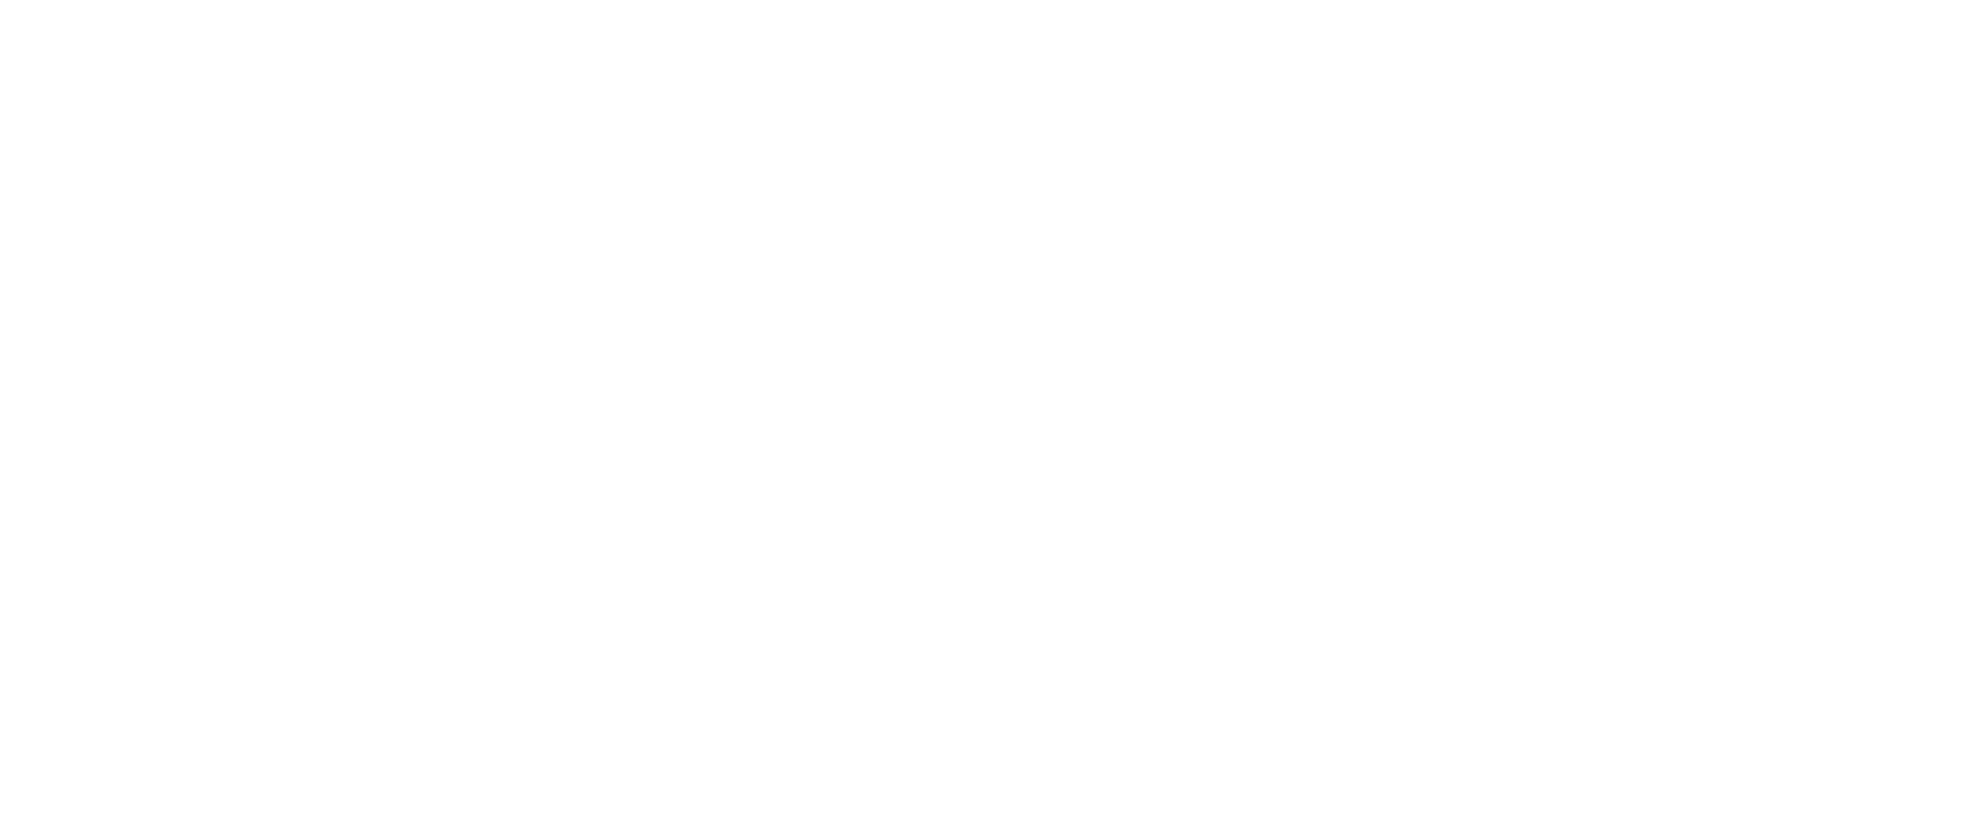 MaryJae Breaking the Taboo